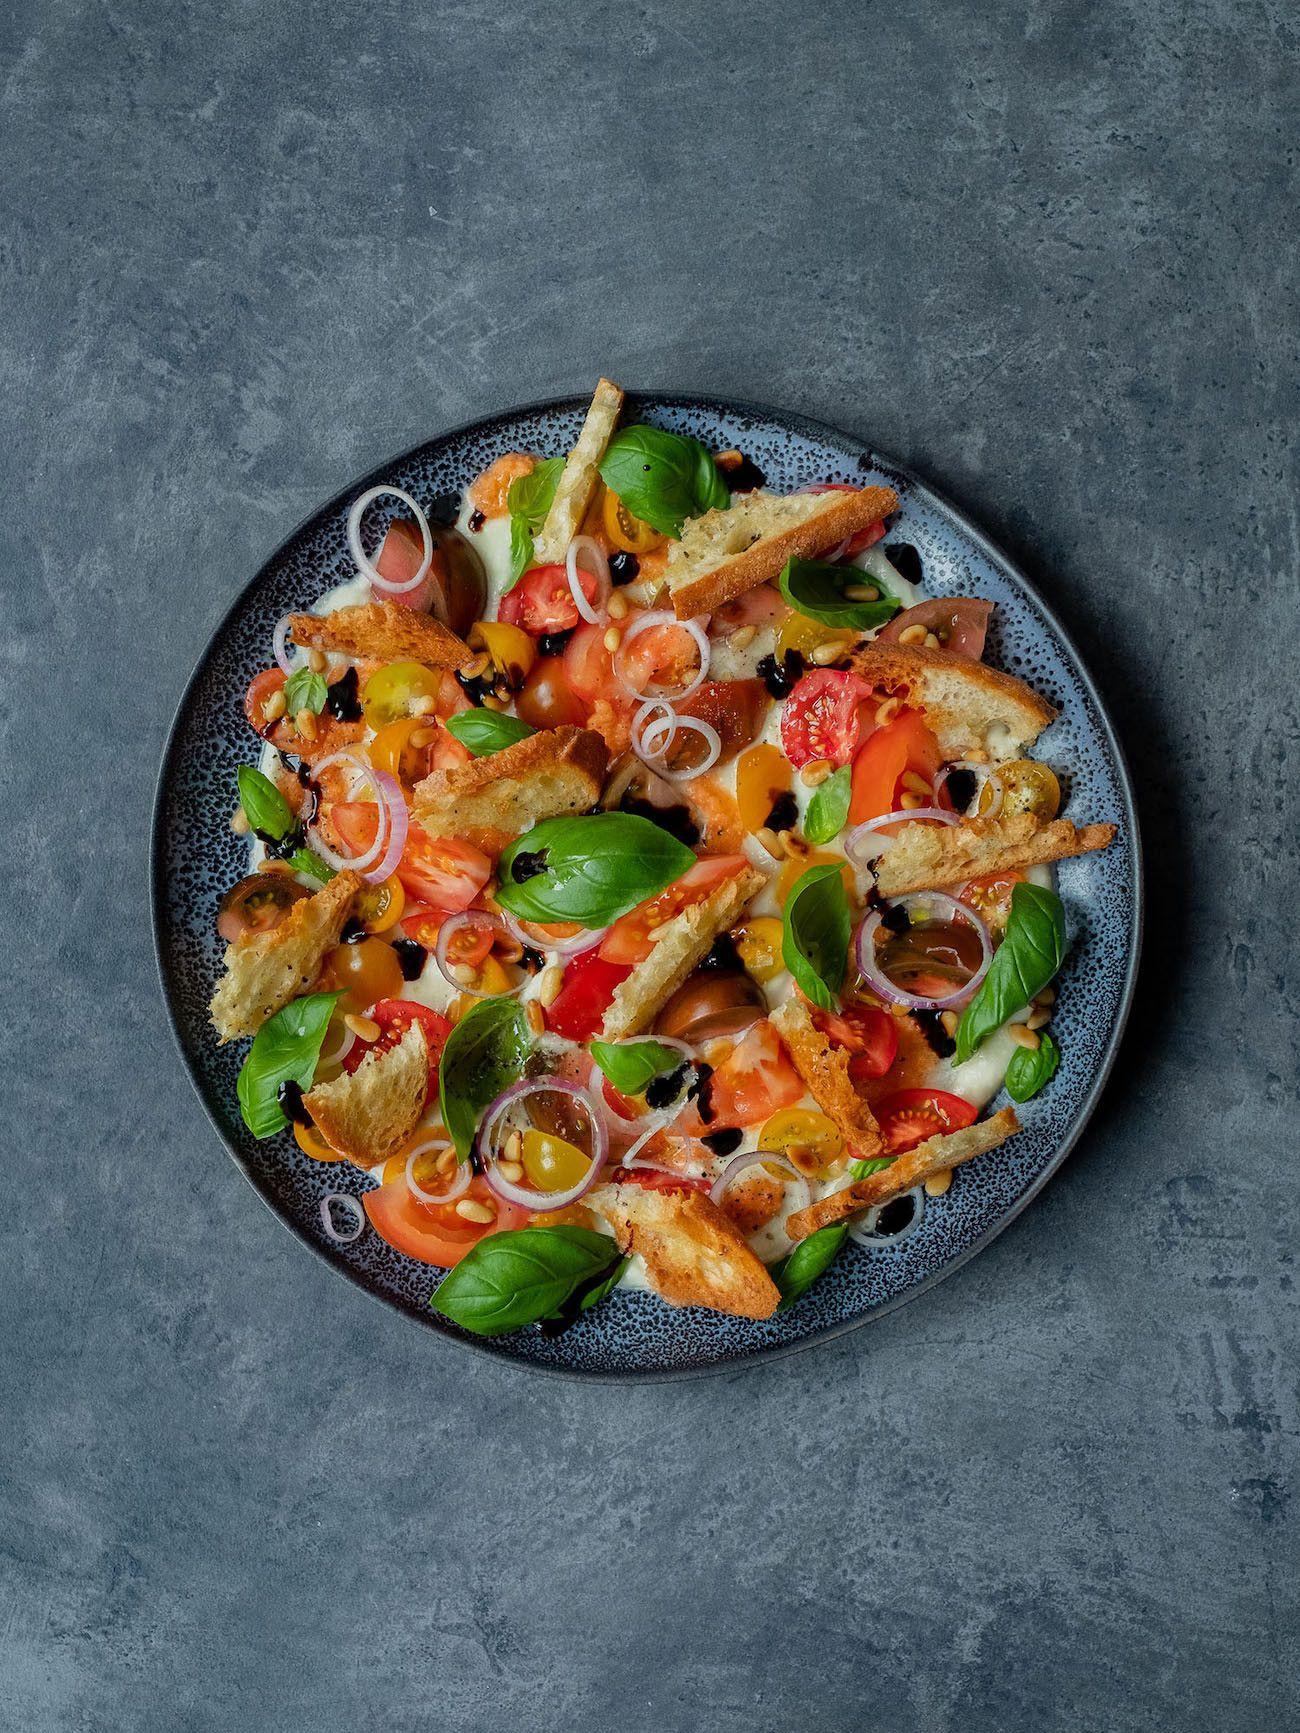 Foodblog, About Fuel, Rezept, Caprese Salat, Tomaten, Basilikum, Nozzarella